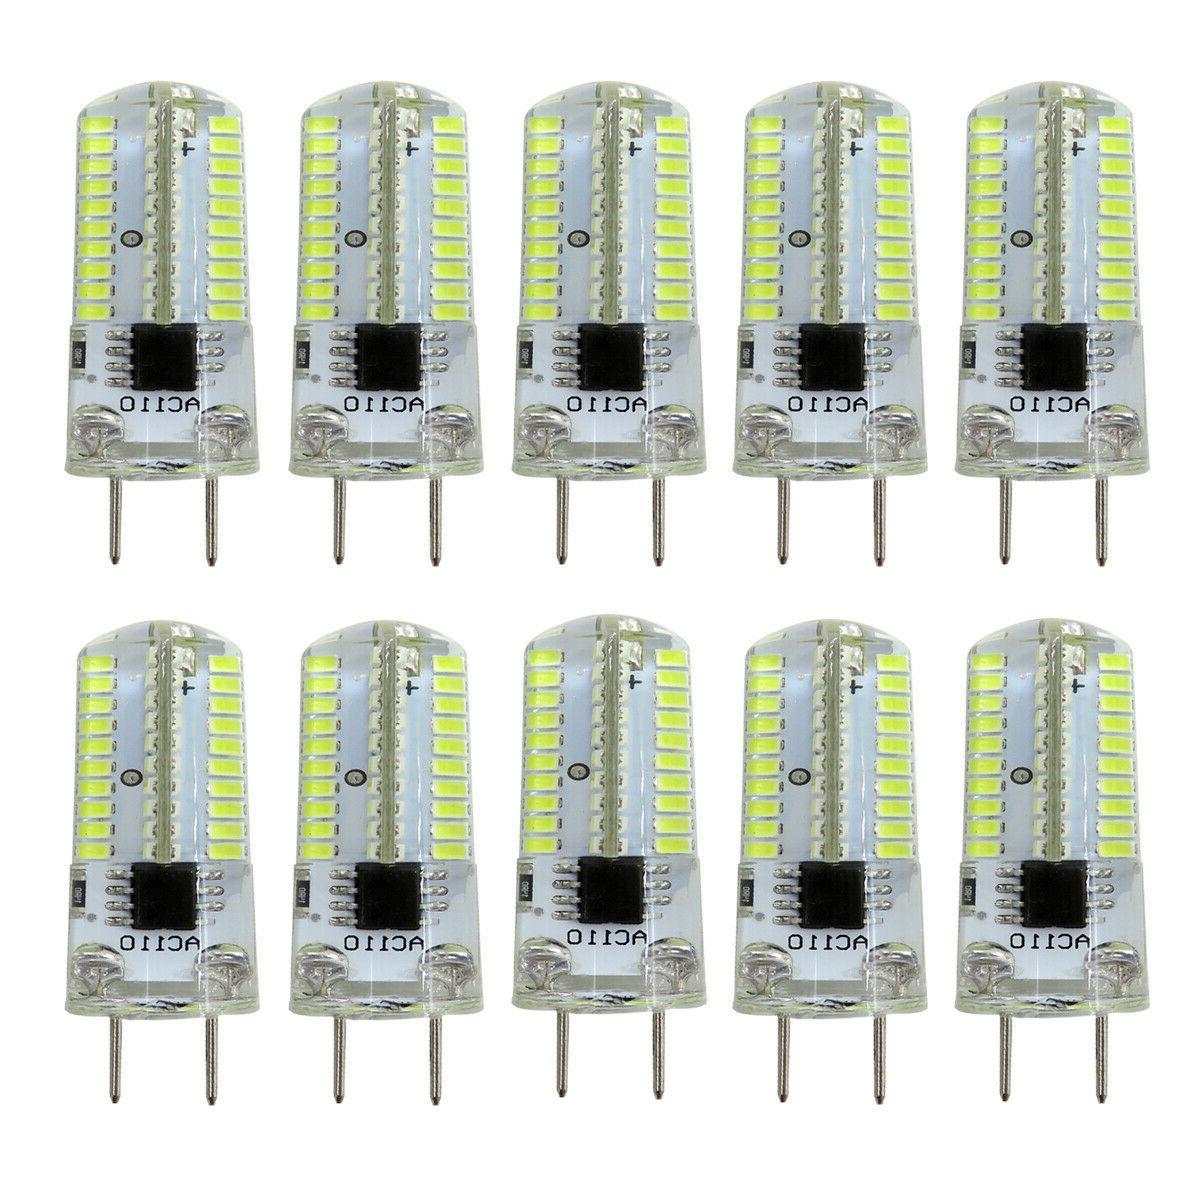 10pcs g8 bi pin t5 80 3014